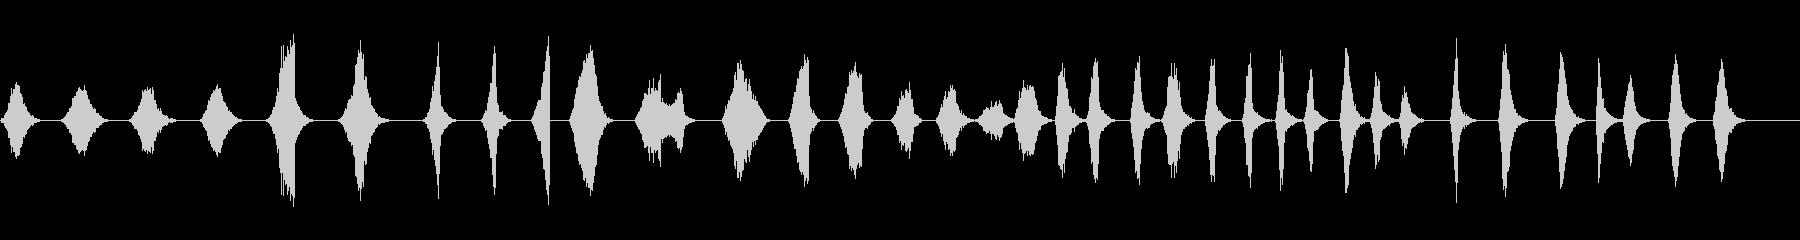 Swishes&Swooshes ...の未再生の波形